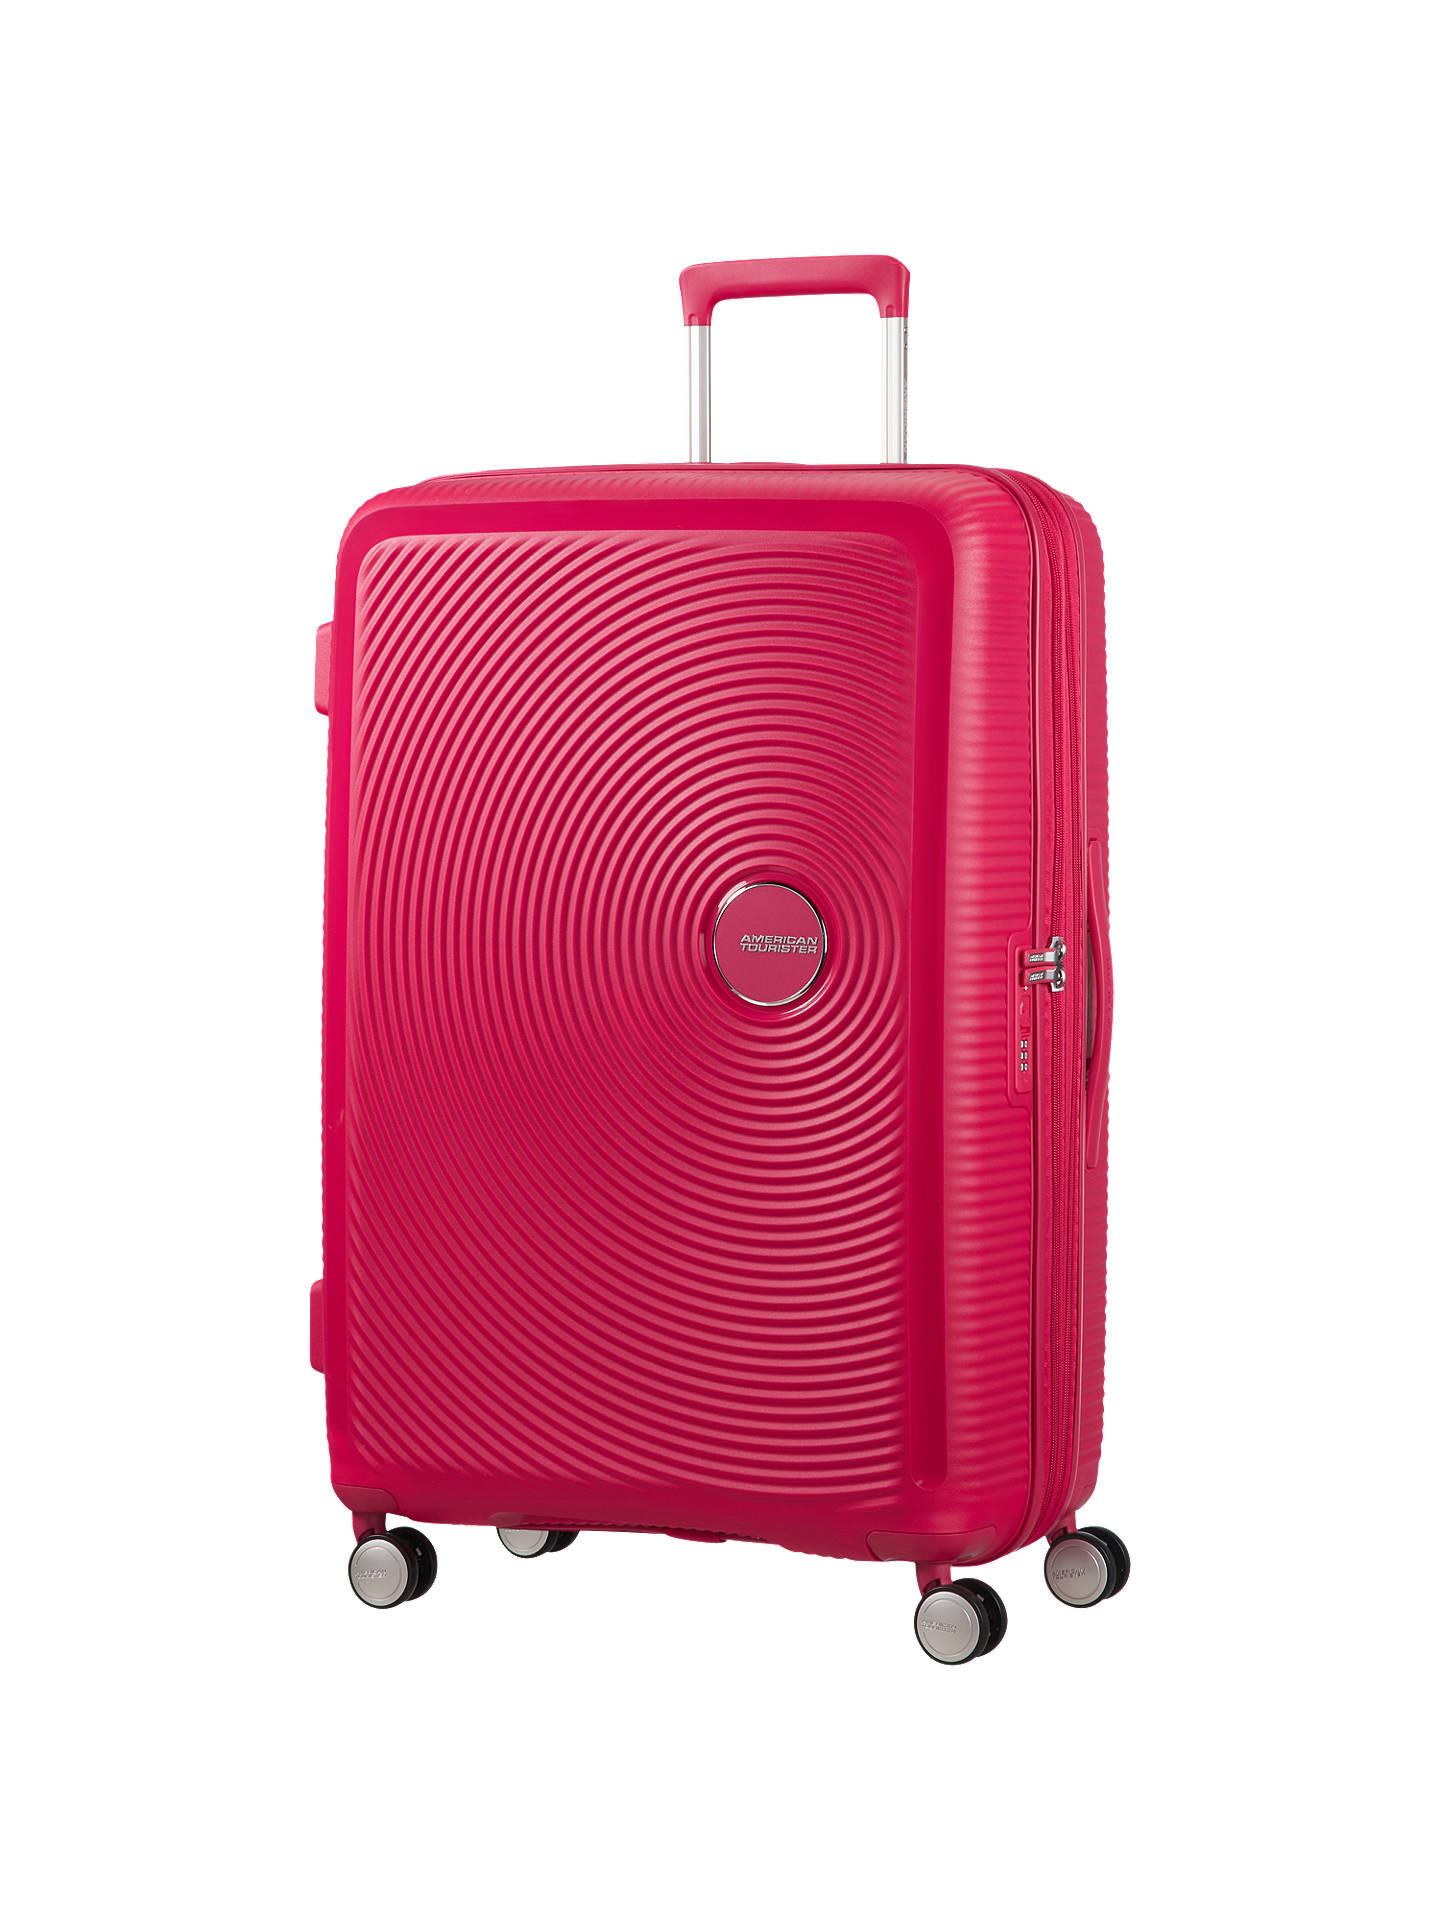 c9ca39d9ef0c American Tourister Soundbox 4-Spinner Wheel 77cm Large Suitcase at ...